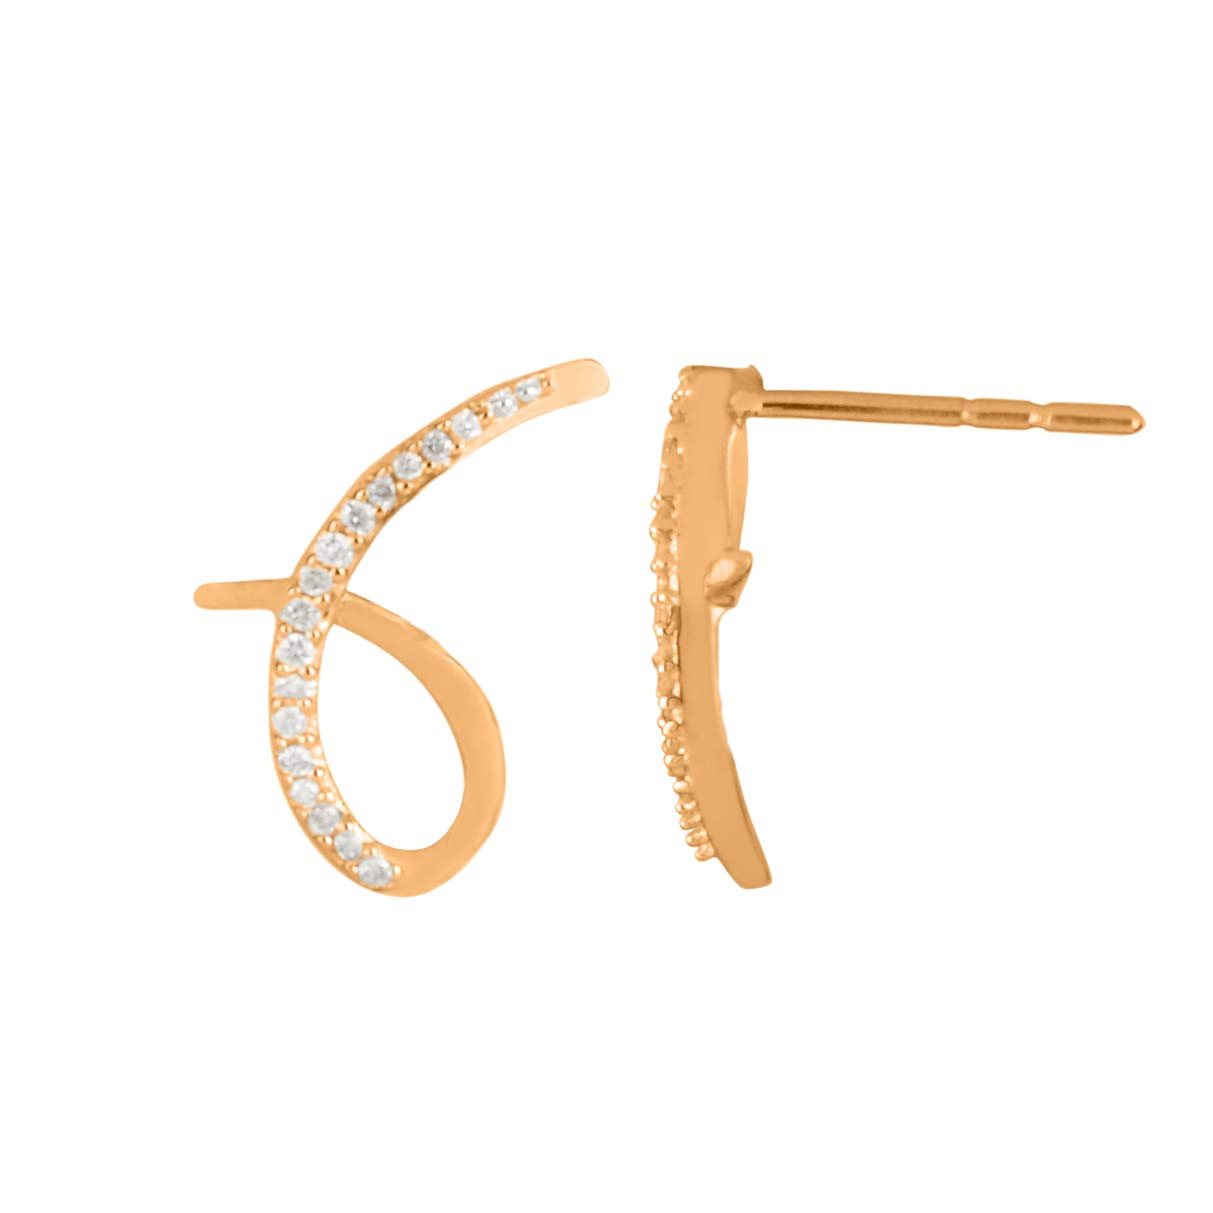 DTJEWELS 4.08 Carat Sim Diamonds White Pearl Girls Stud Earrings In 18K Gold Plated 925 Sterling Silver